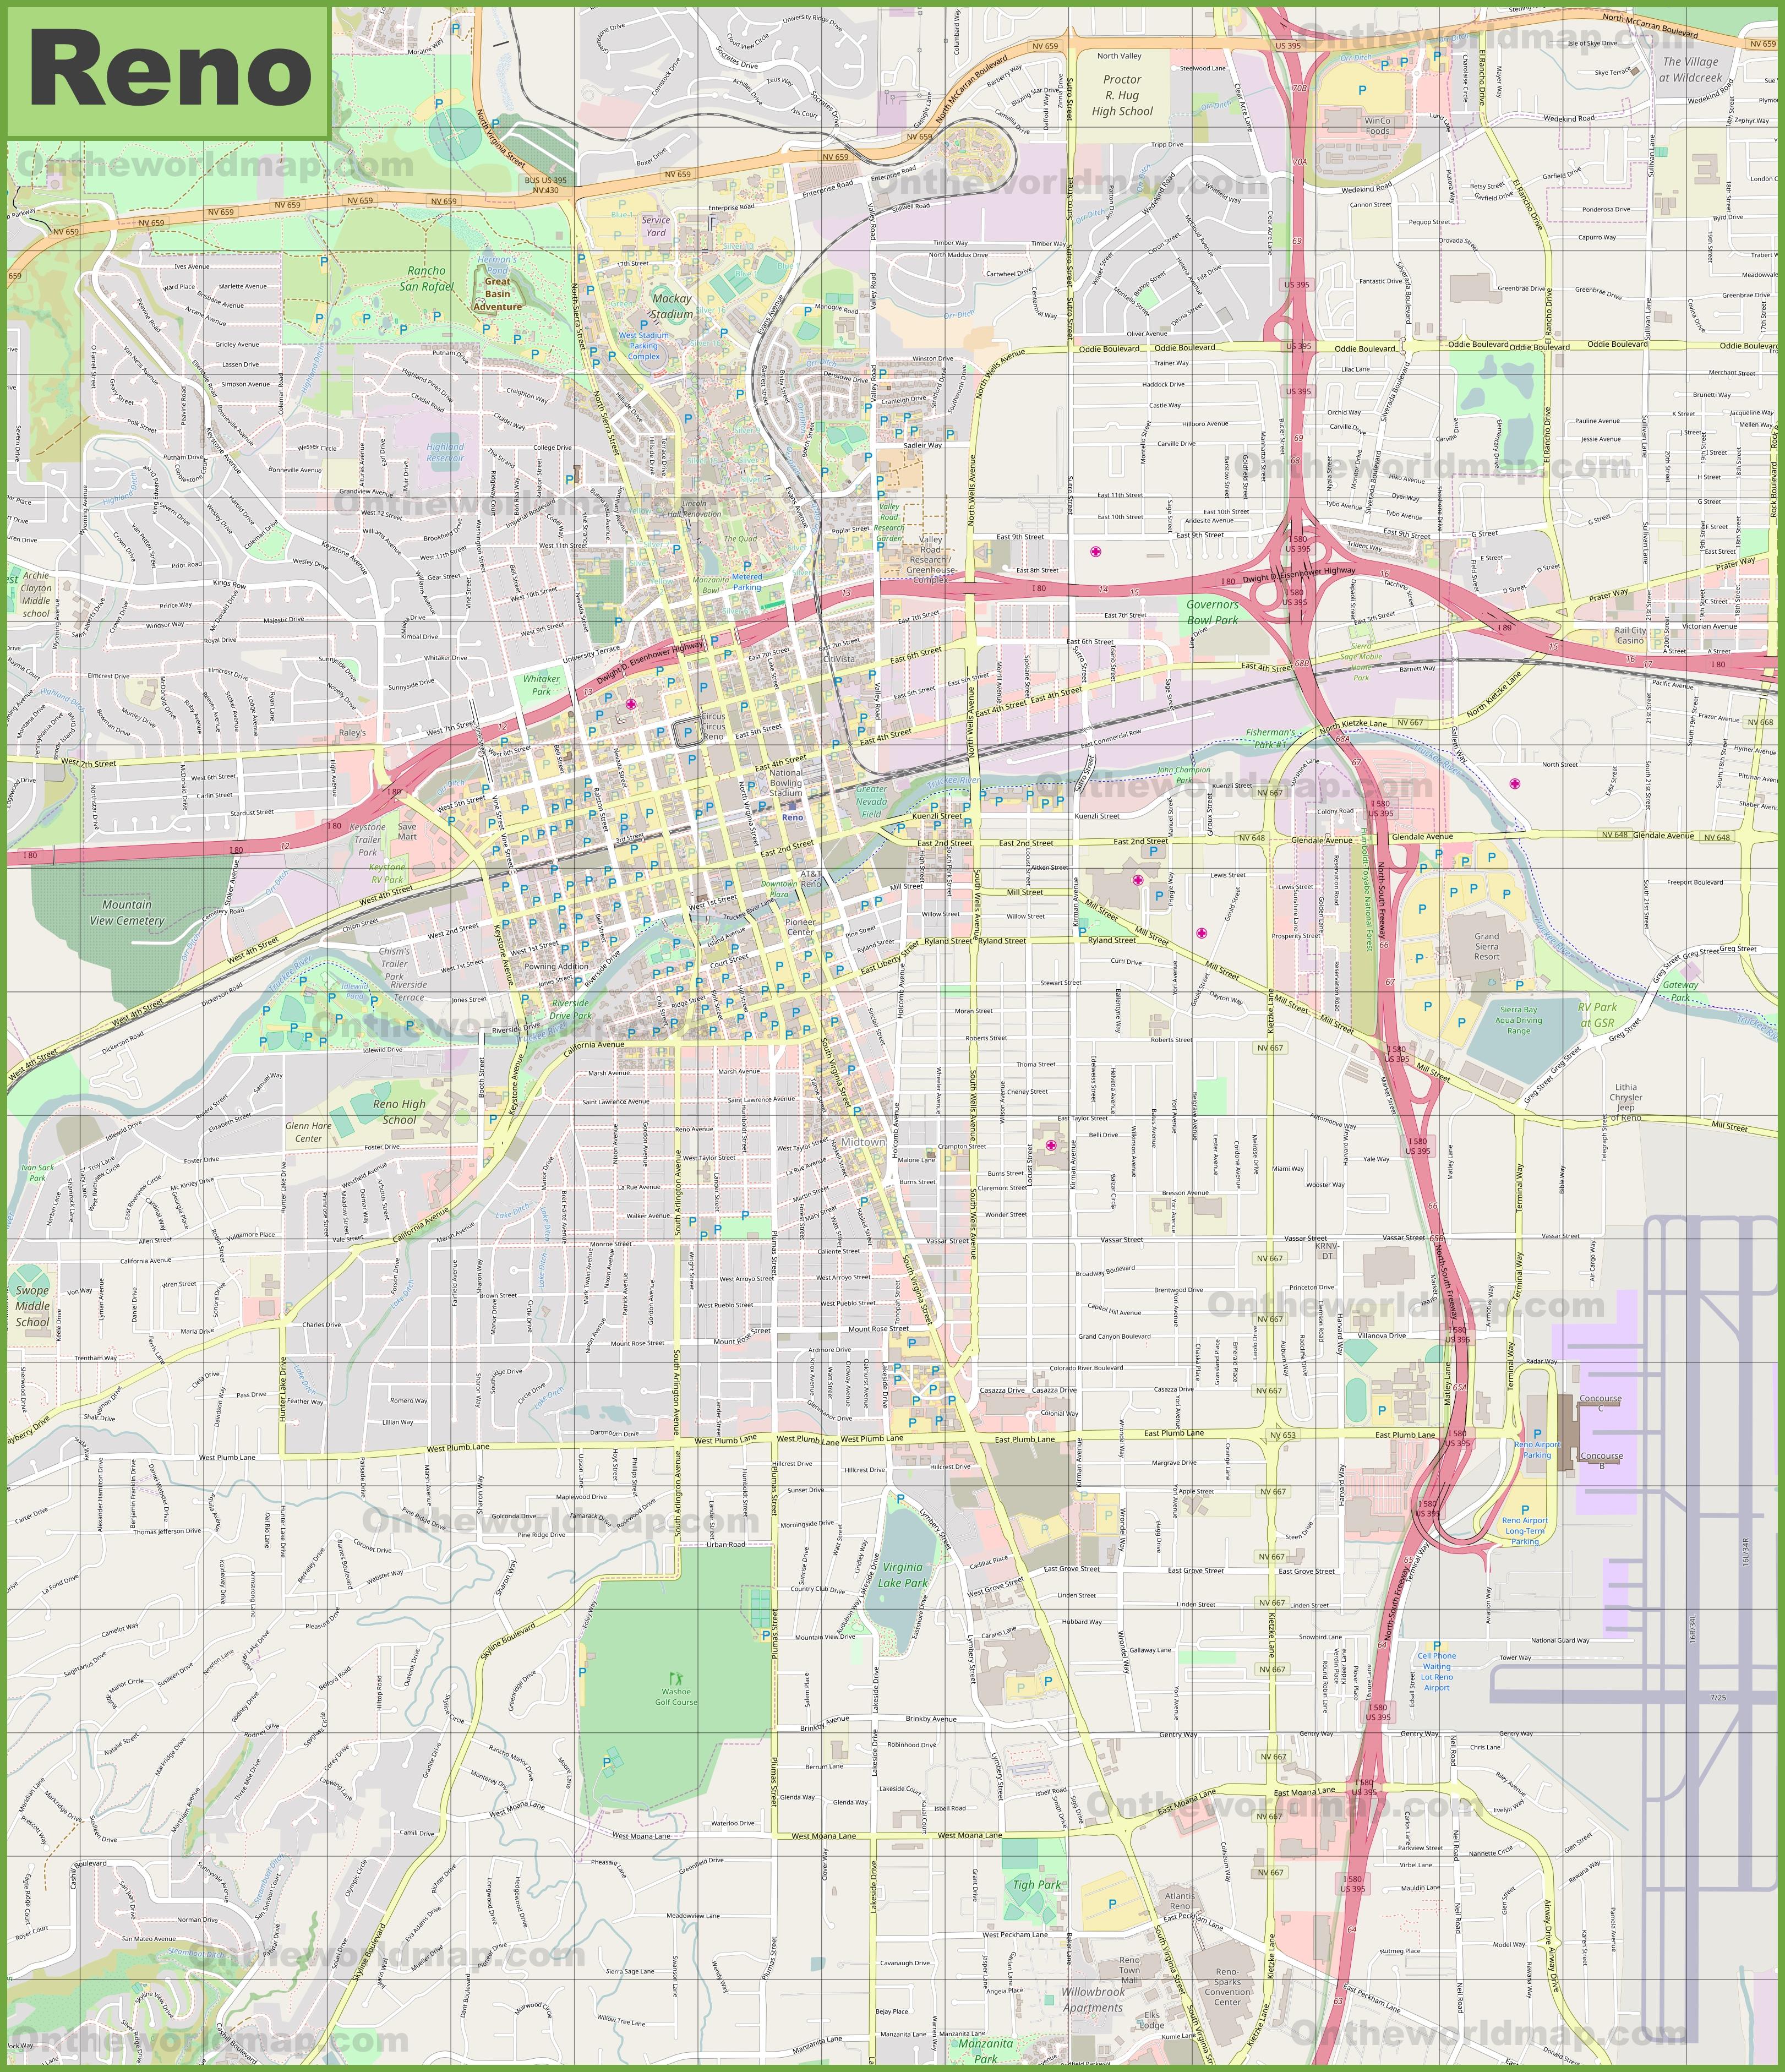 kansas city street map with Large Detailed Map Of Reno on File Detailed map of Oakley  Kansas as well 18 Yorkville Condos moreover D0BB Graffiti Alley Kansas City Missouri besides Map Of Sabetha Ks WA16 iFFN50SS 7CAoVa2BhwAGwTeoIvviblhOfa9deXE also Warriors Victory Parade.